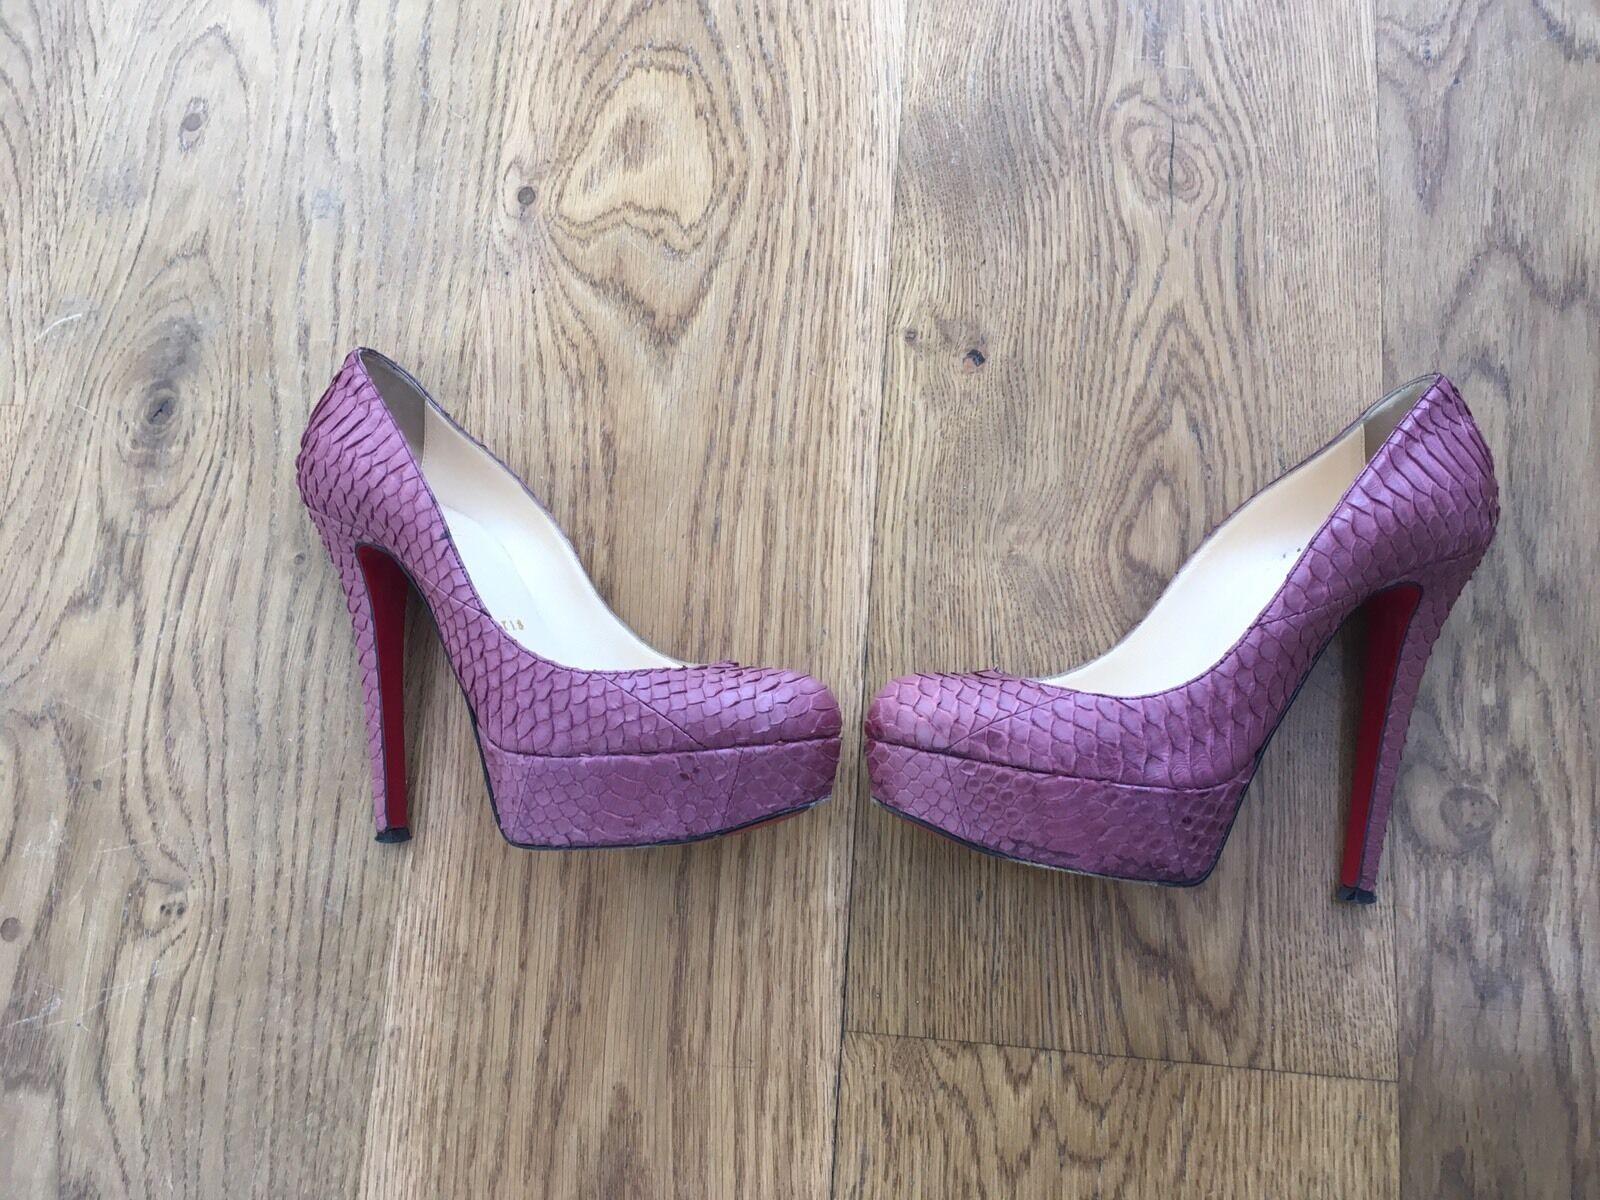 CHRISTIAN LOUBOUTIN  Snakeskin 'white 140' Platform Pumps shoes 36 US 6 UK 3